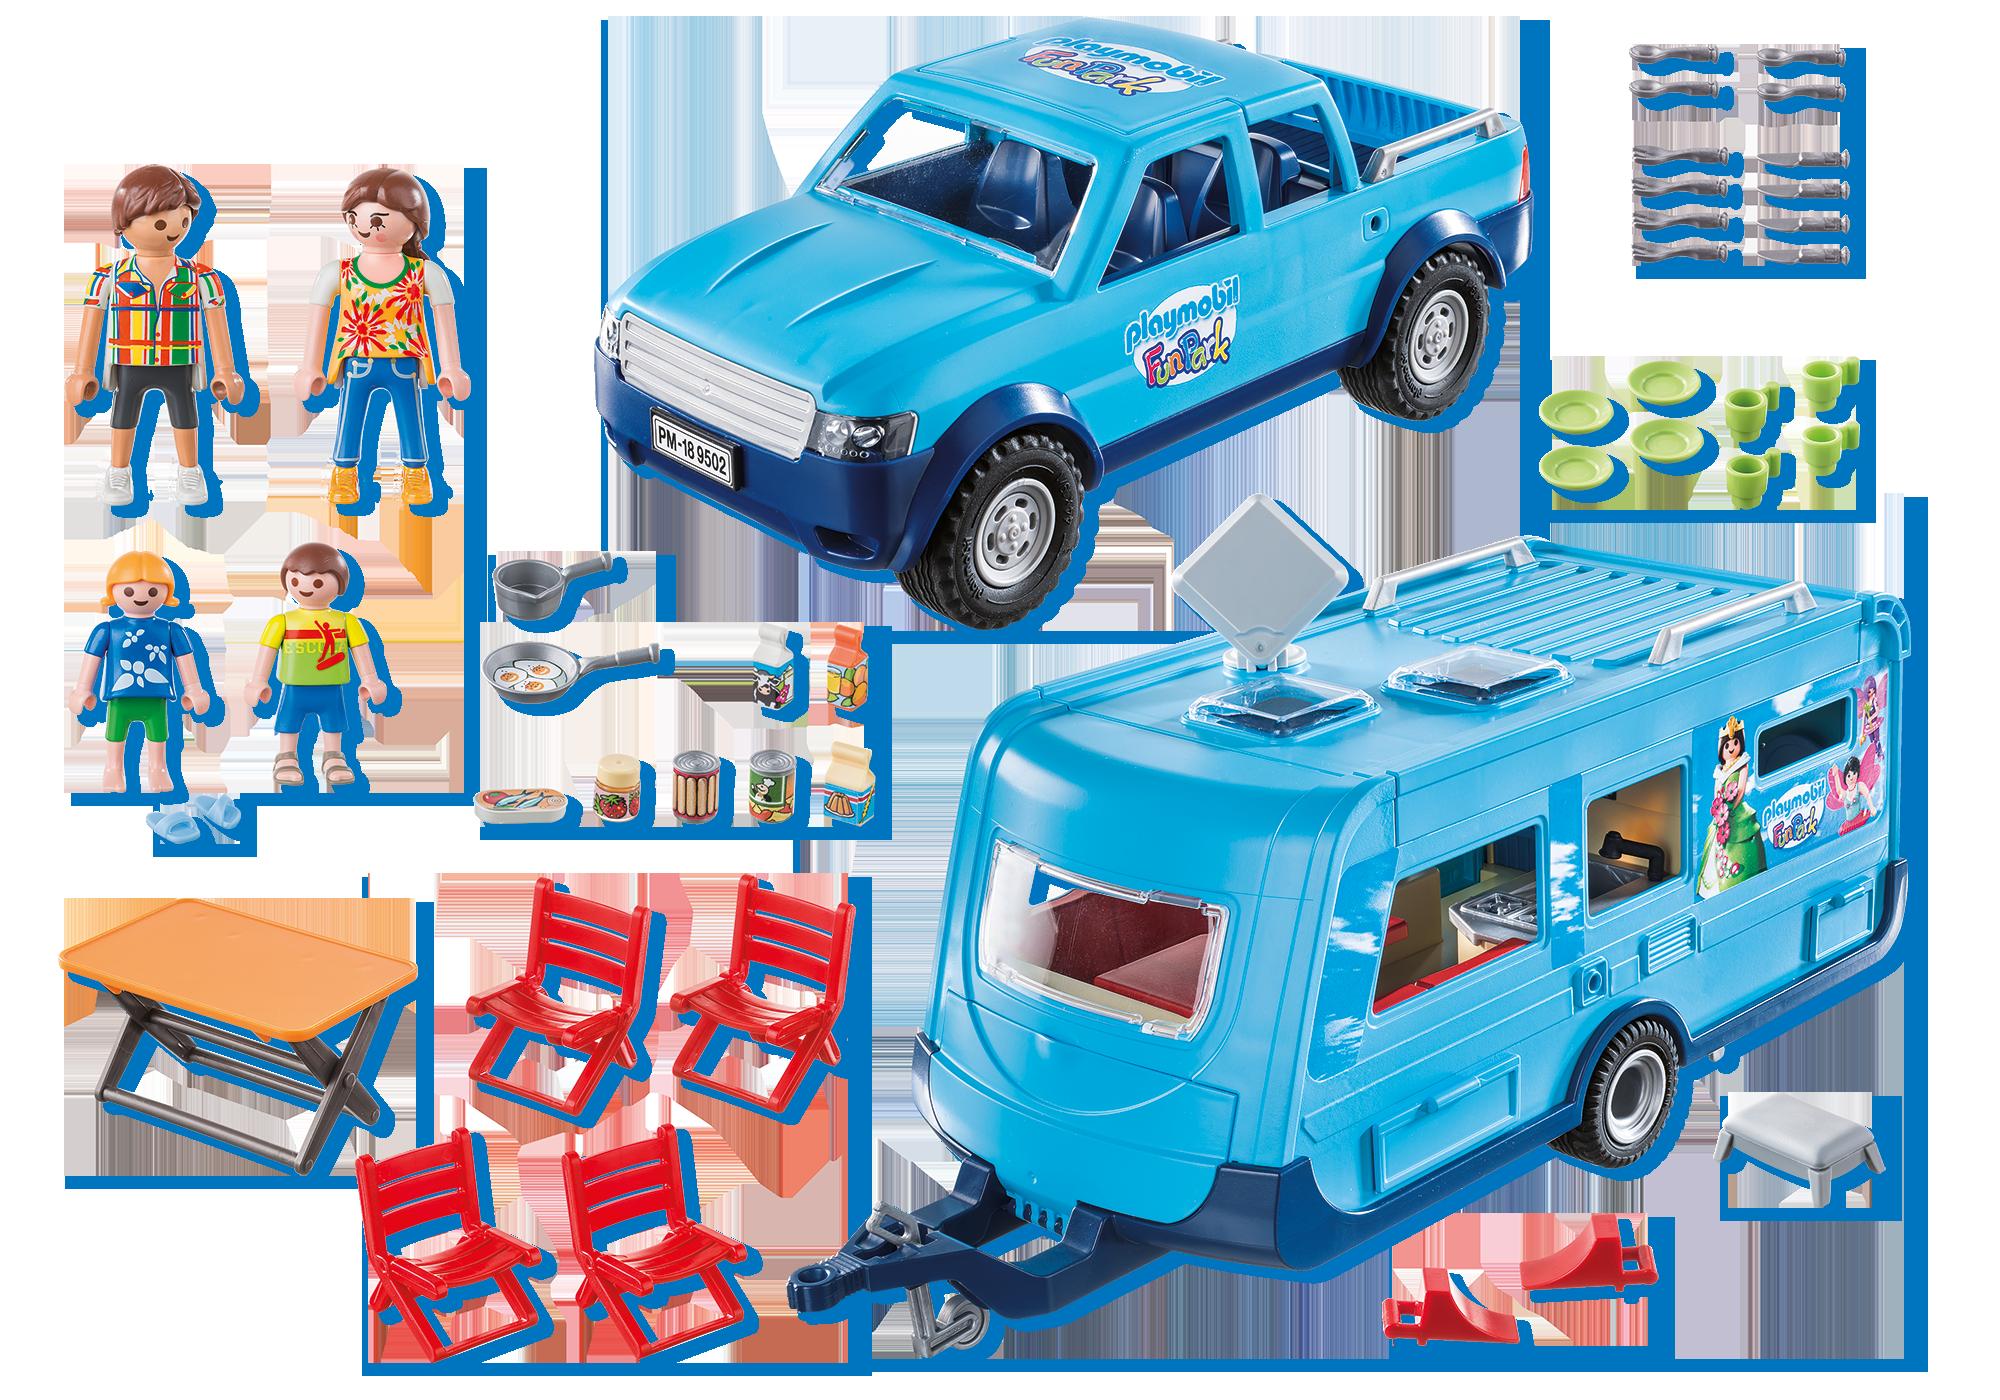 http://media.playmobil.com/i/playmobil/9502_product_box_back/Playmobil-Pick-Up mit Wohnwagen